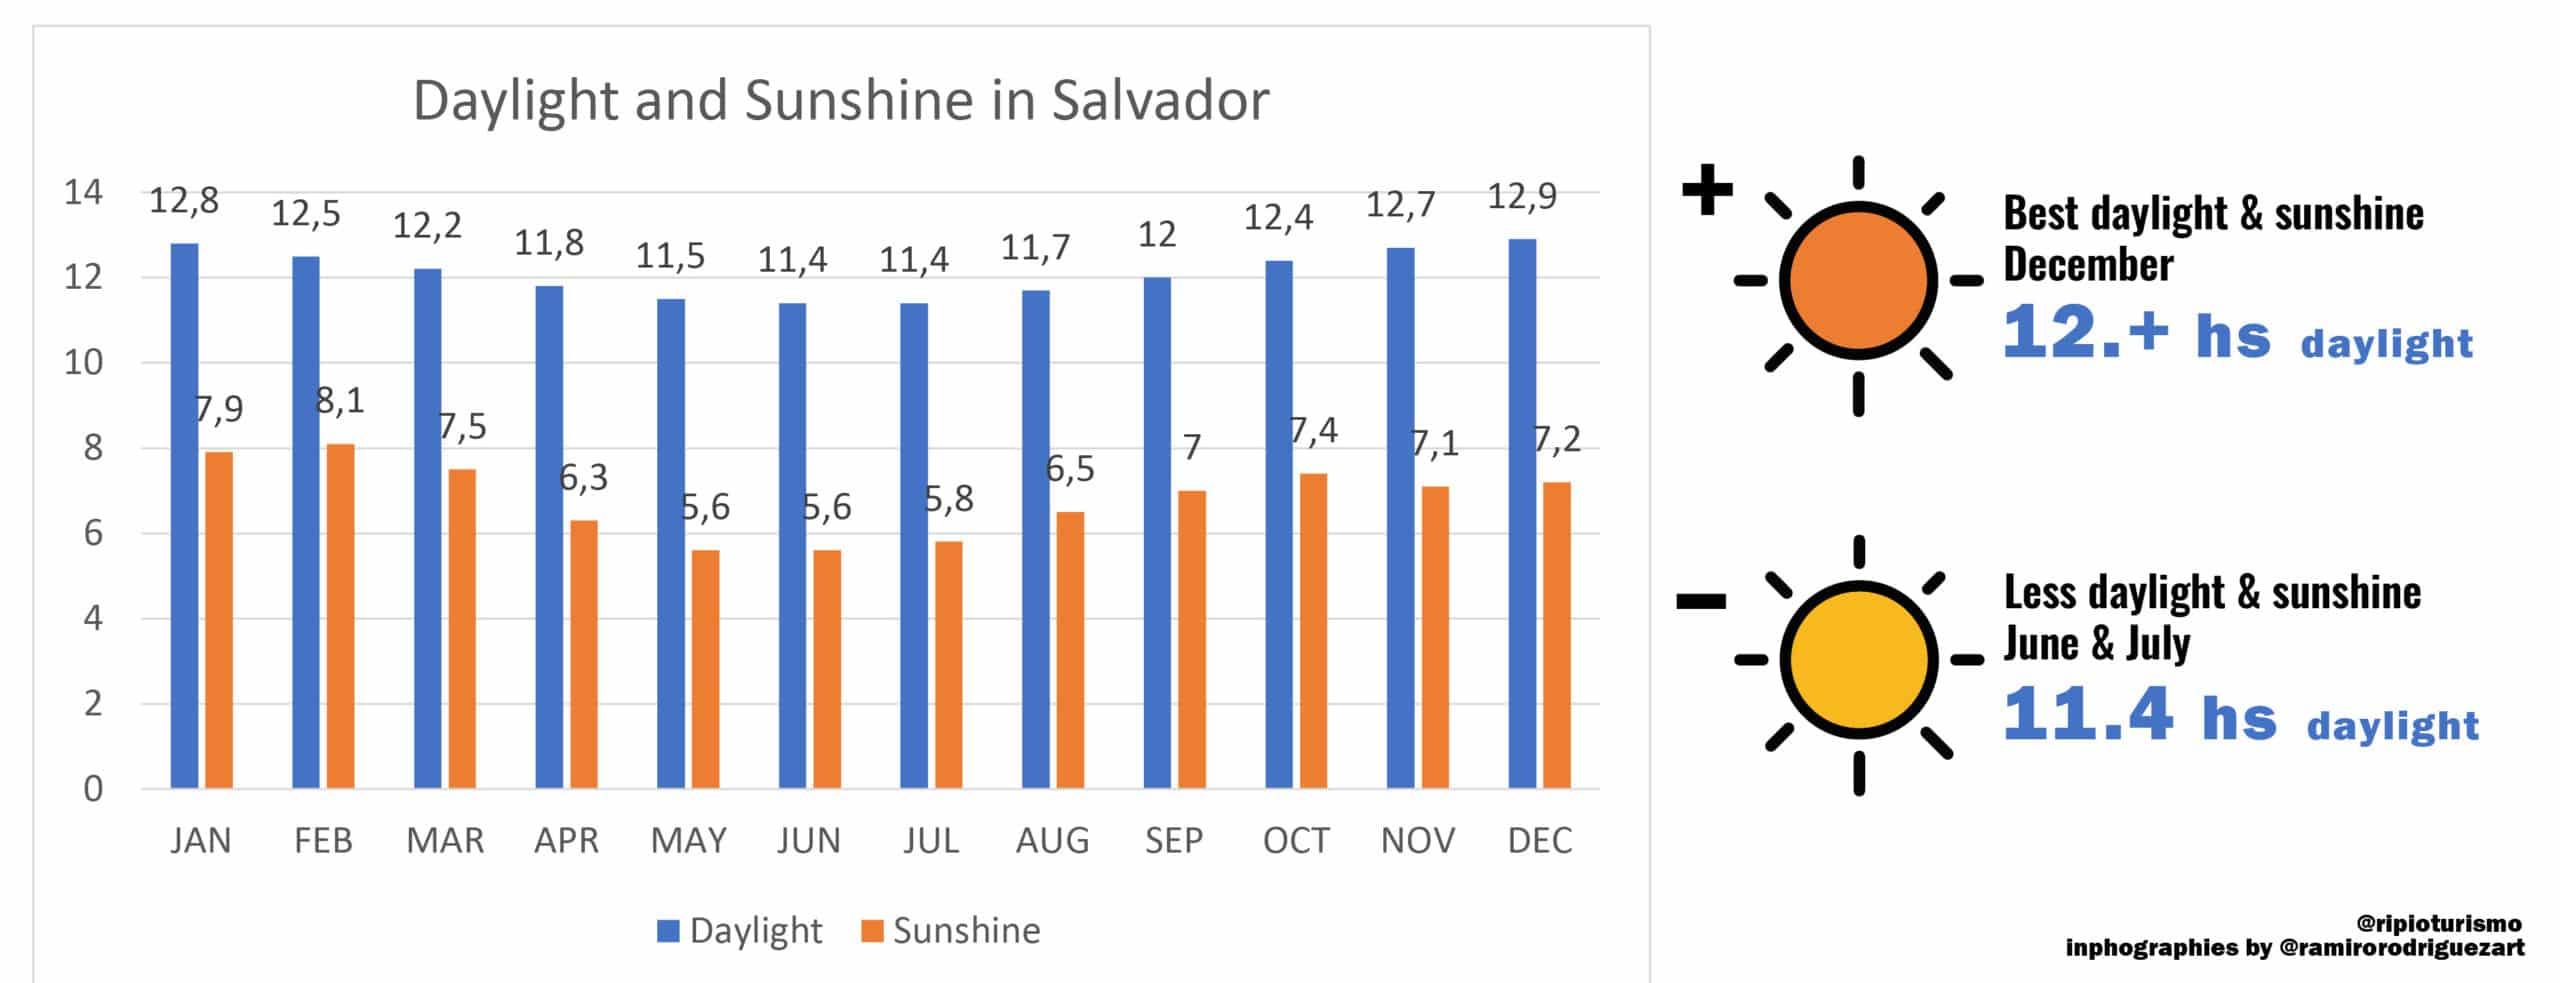 Salvador de Bahia. Daylight and Sunshine in Brazil - RipioTurismo DMC